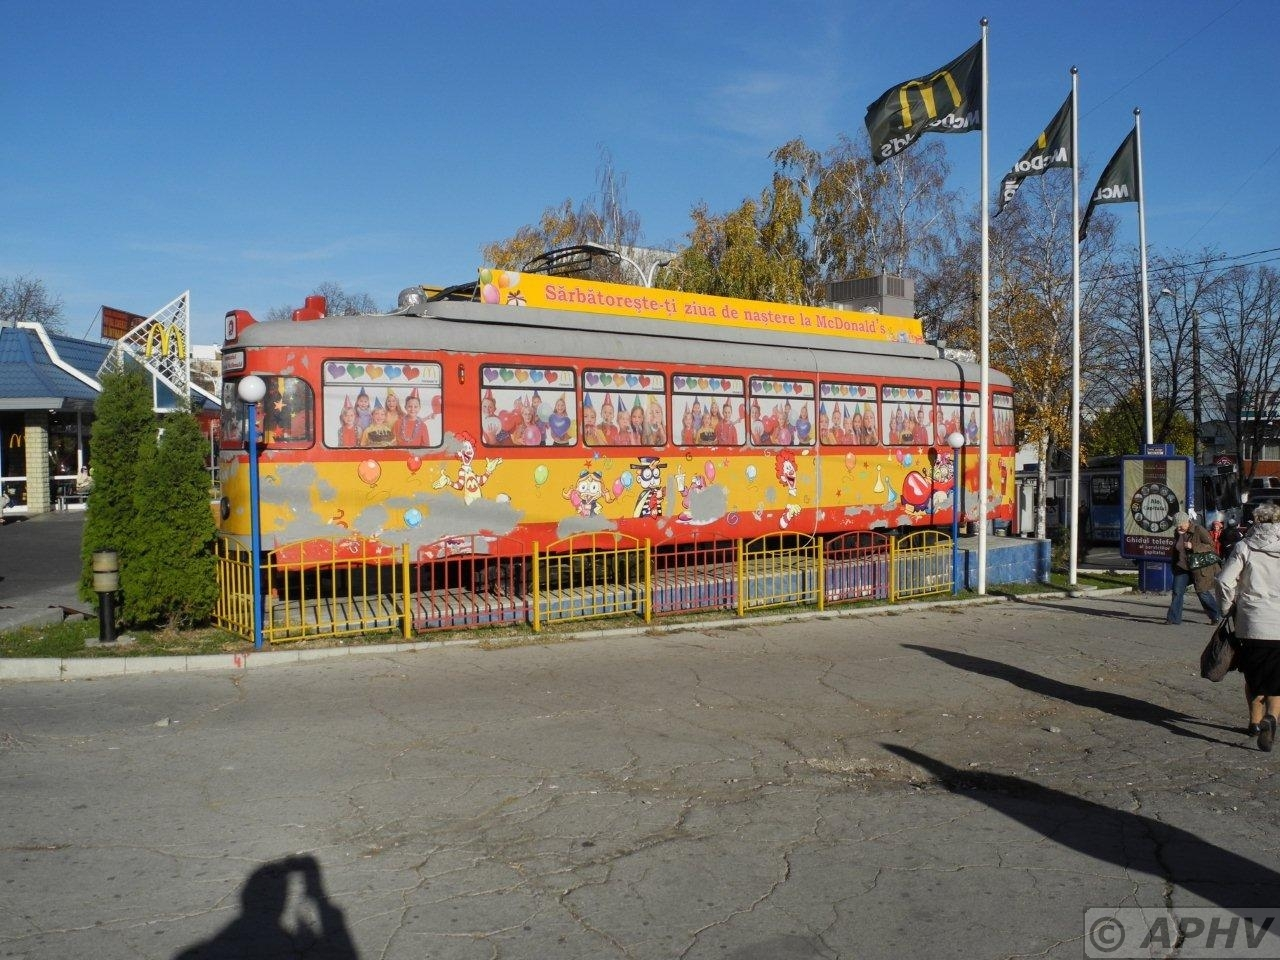 metro trolley bus ferries peter velthoen. Black Bedroom Furniture Sets. Home Design Ideas